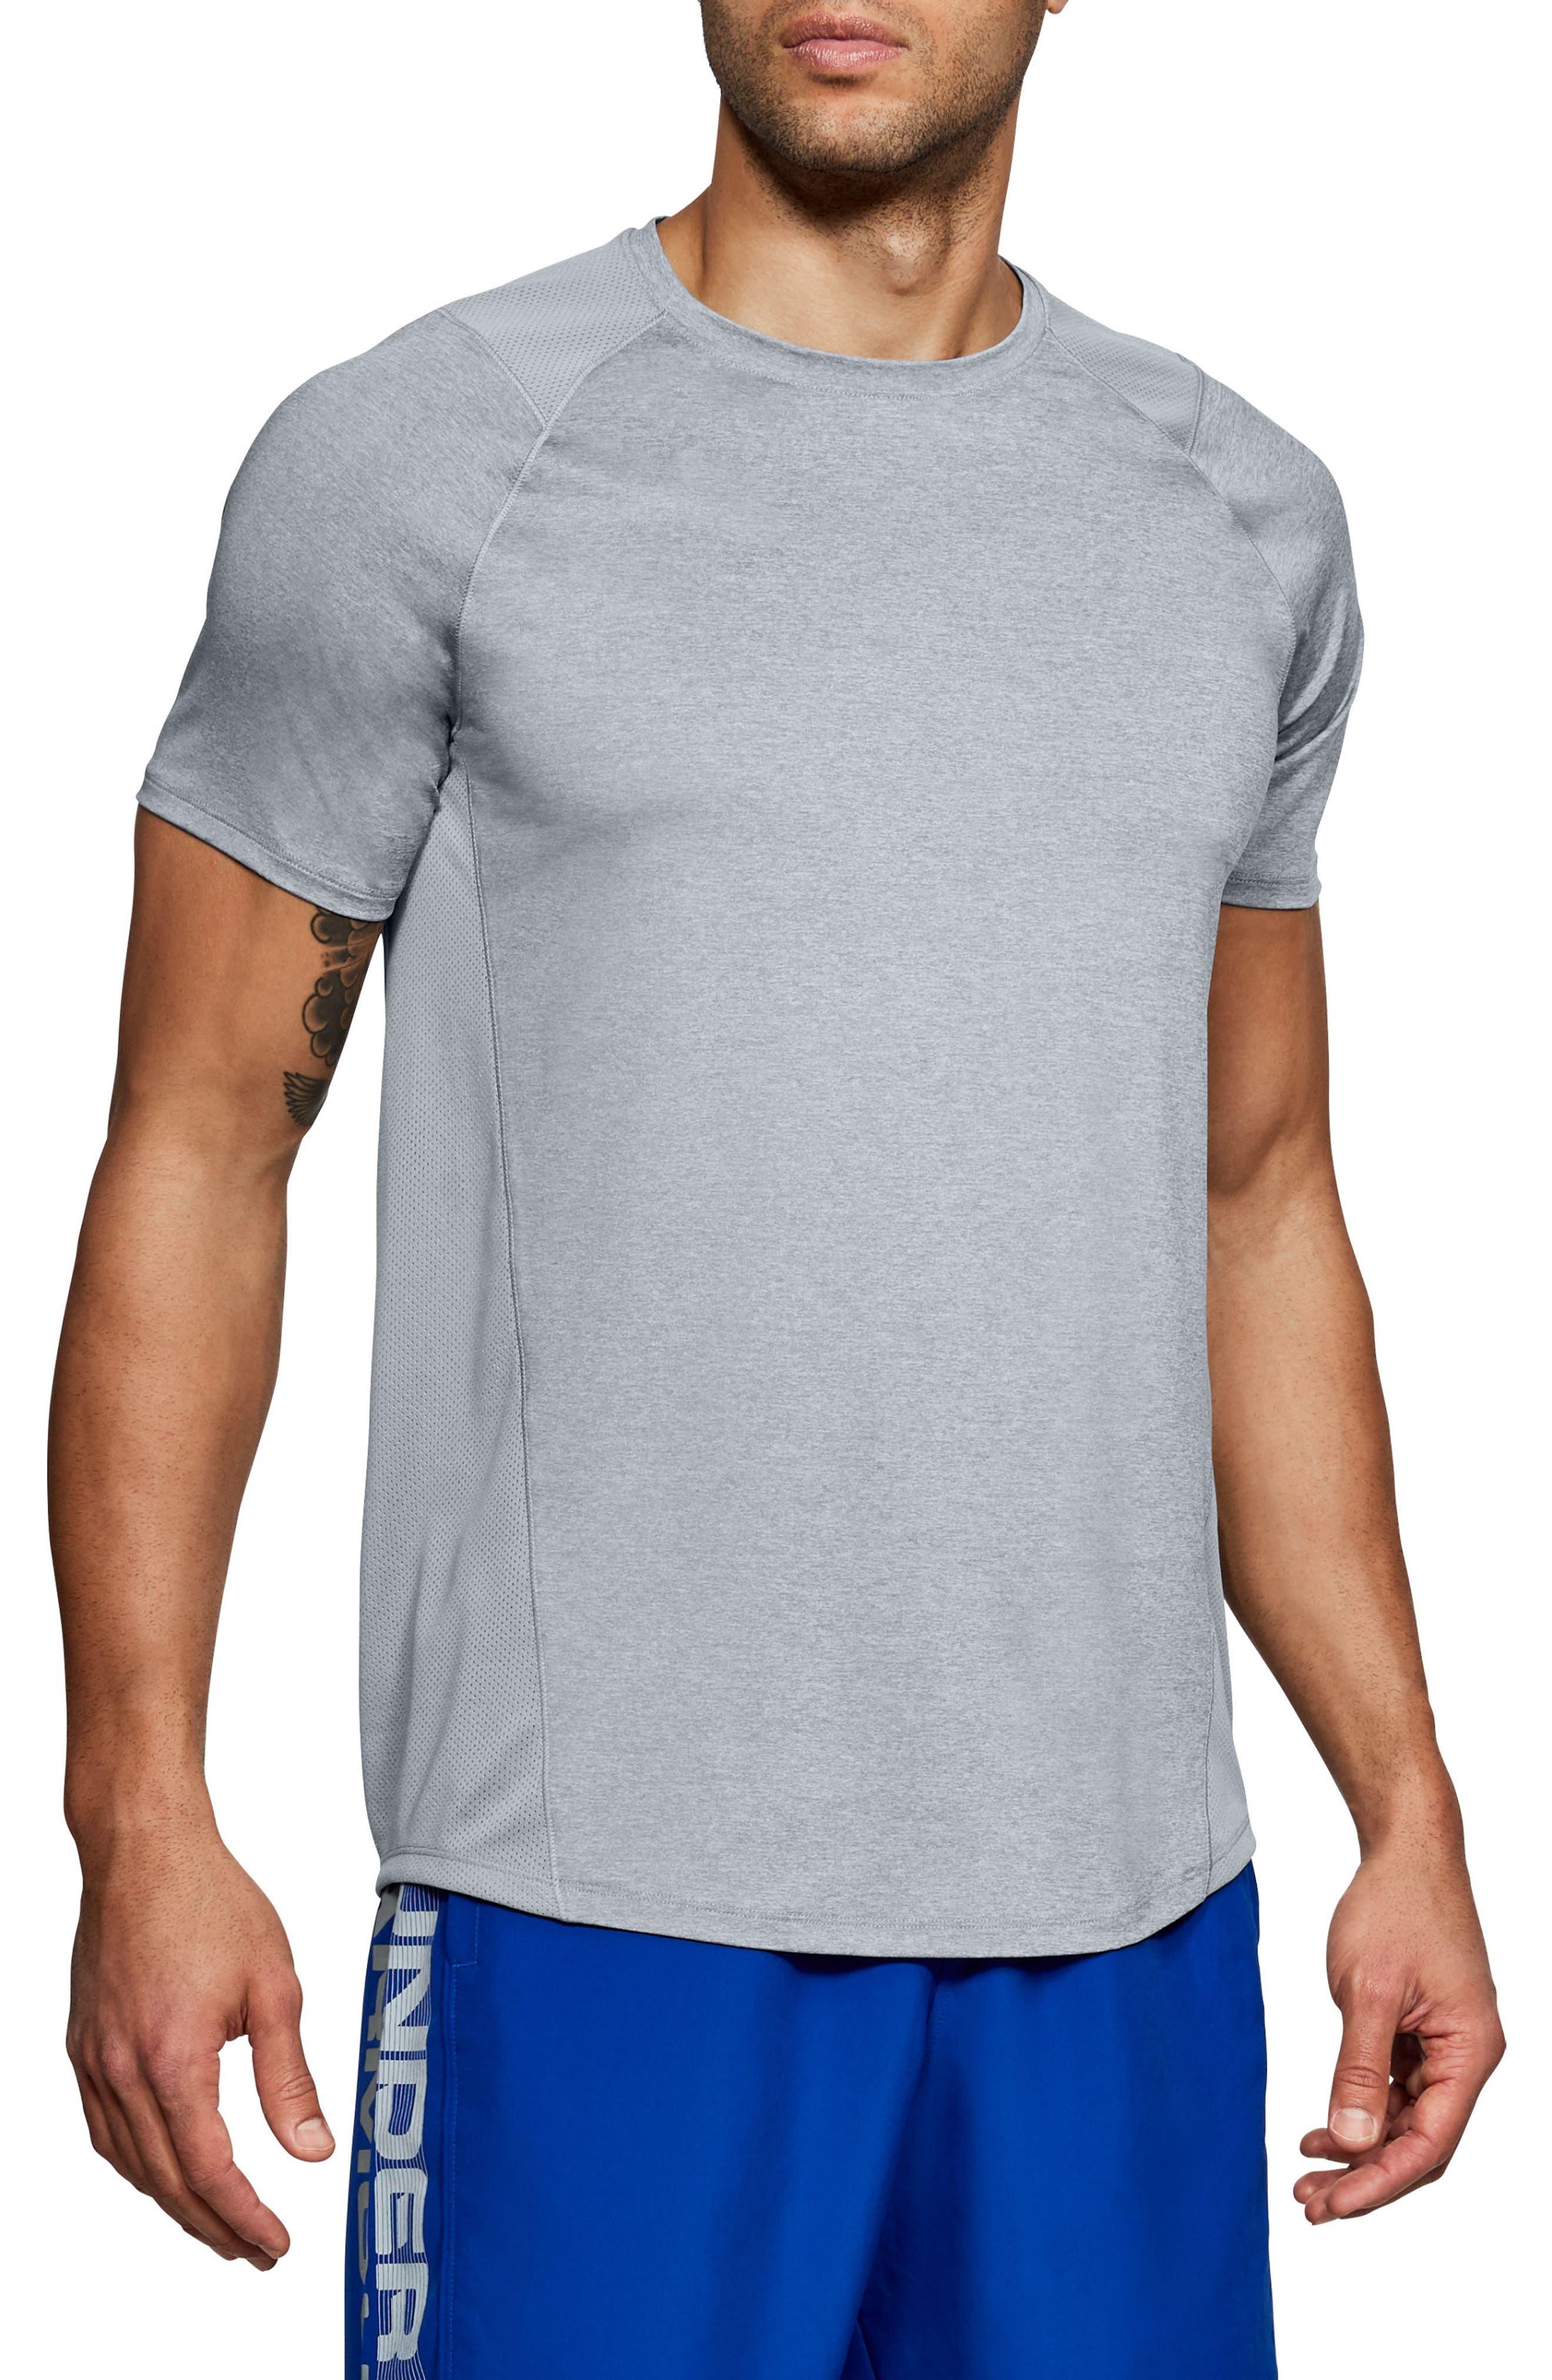 Raid 2.0 Crewneck T-Shirt,                         Main,                         color, STEEL LIGHT HEATHER/ GRAPHITE